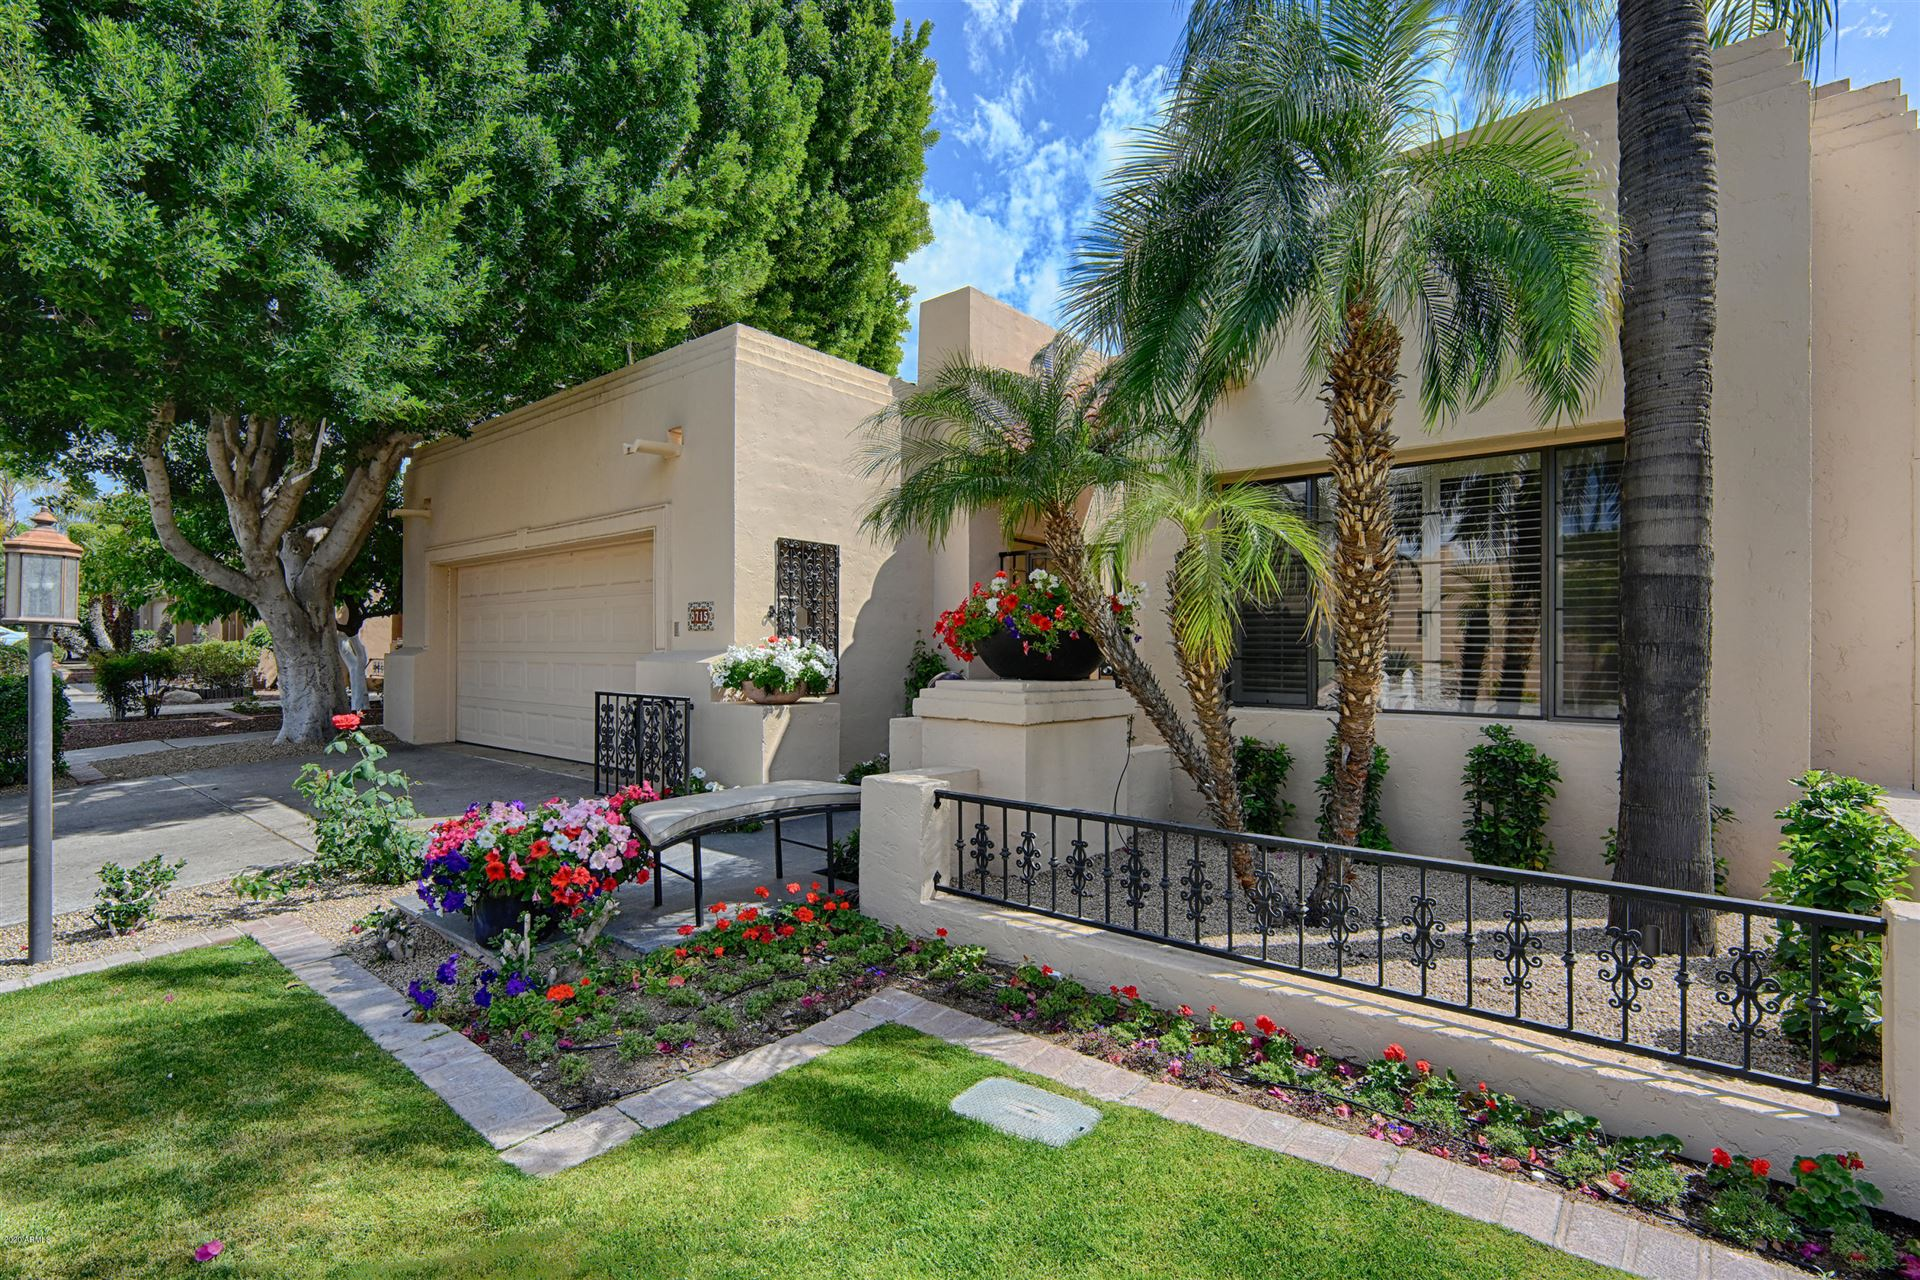 8715 E PARAISO Drive, Scottsdale, AZ 85255 - #: 6022696